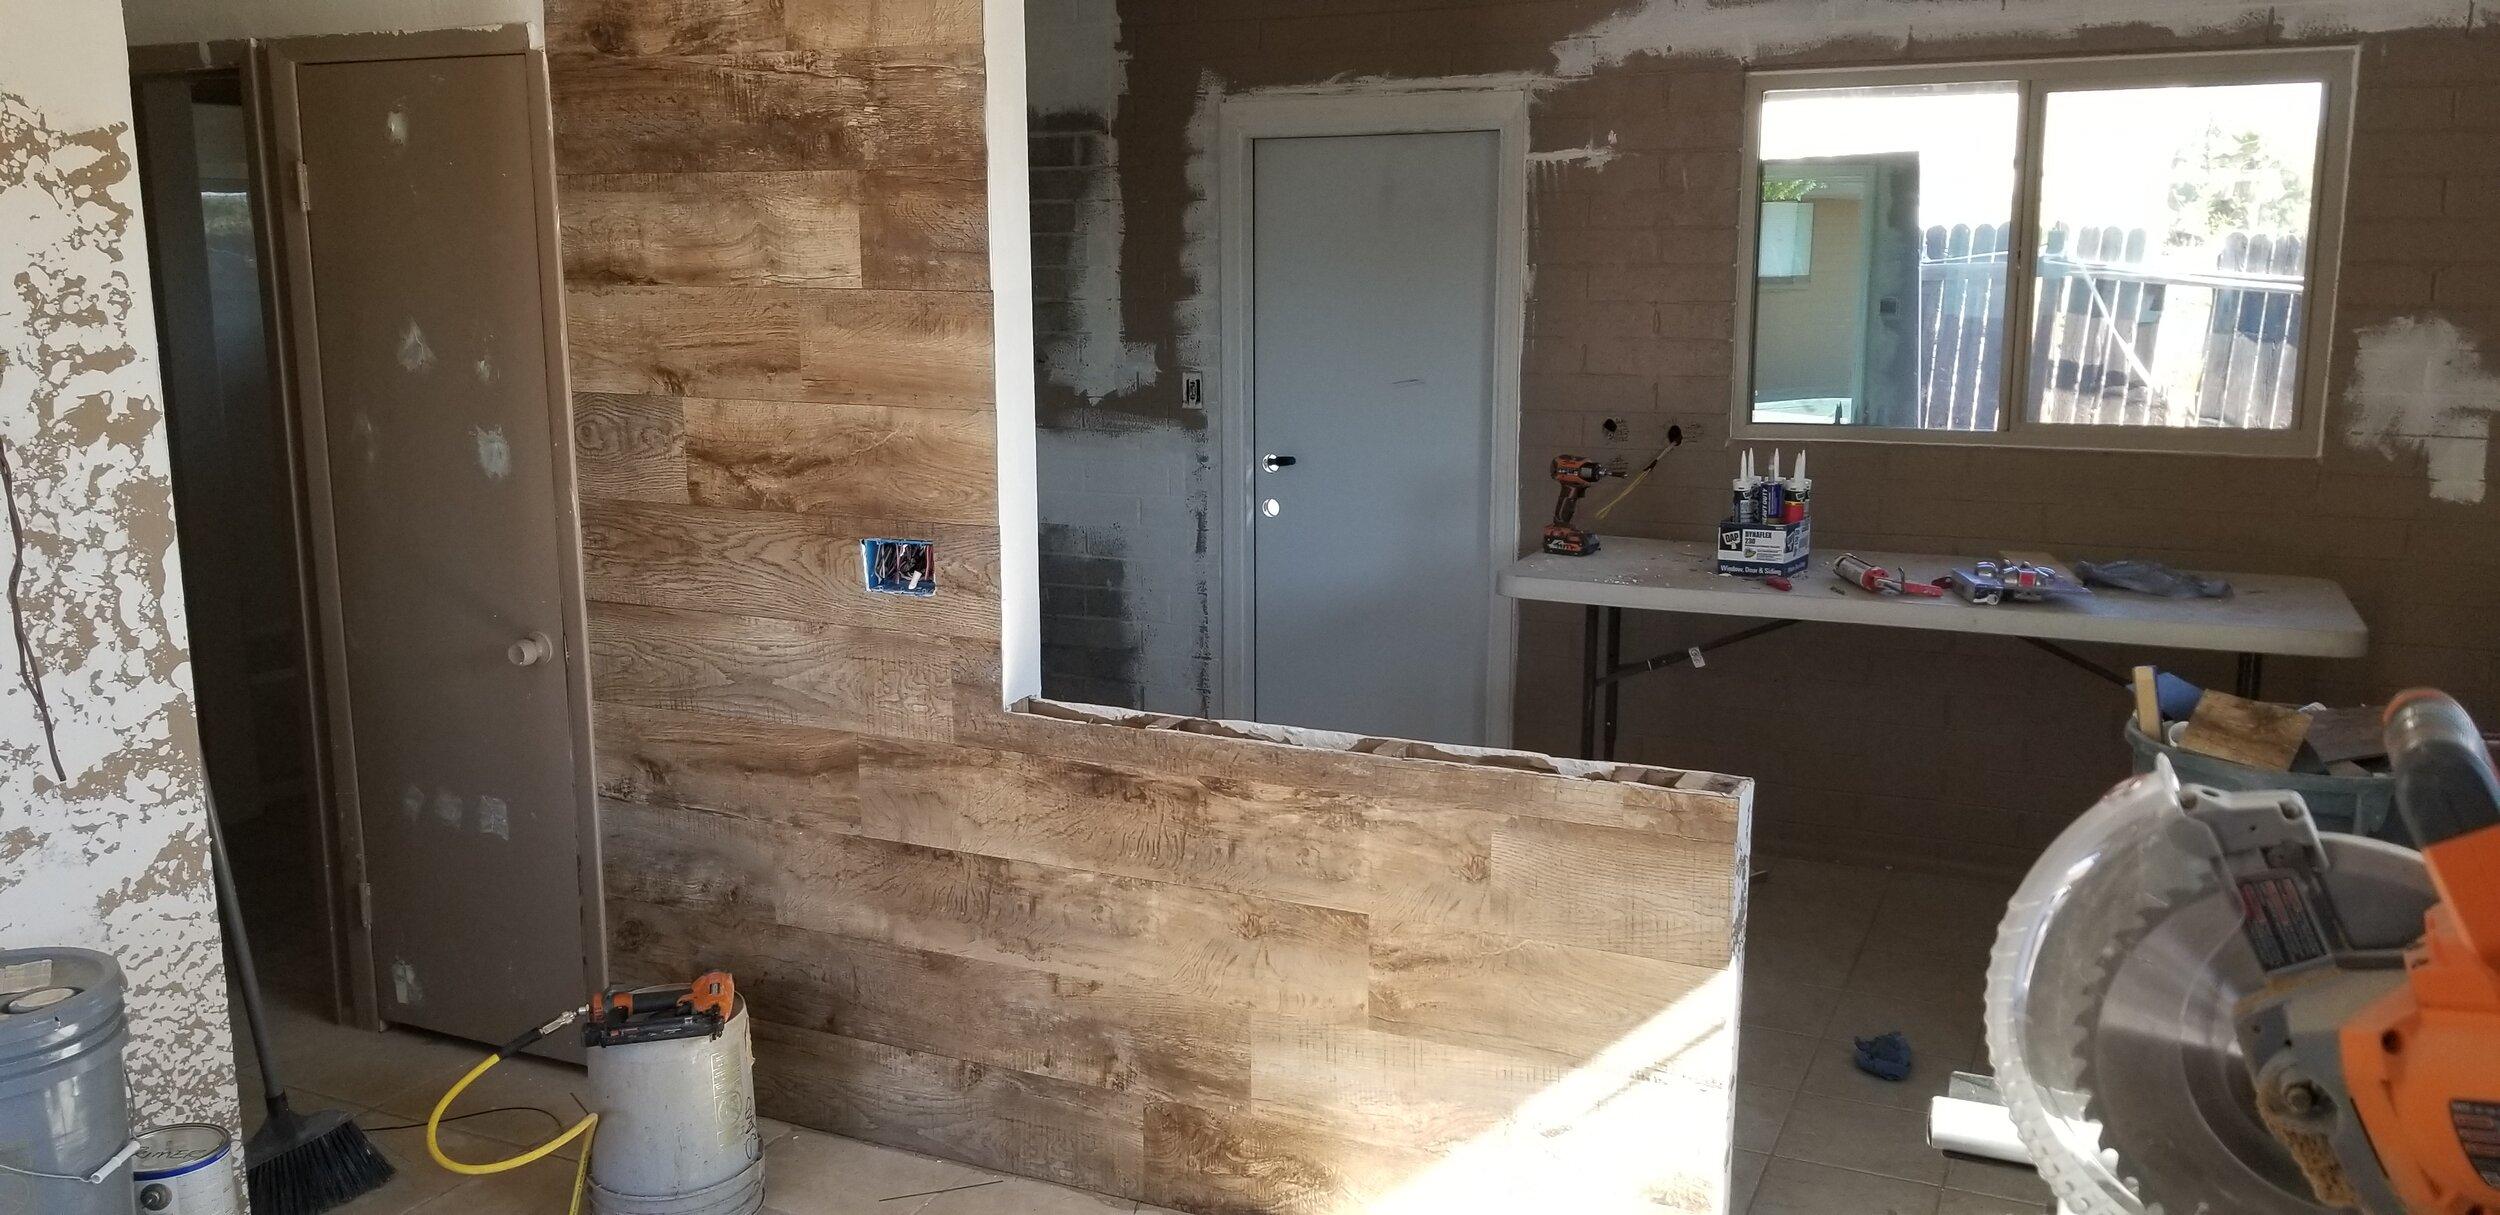 Living room half wall complete